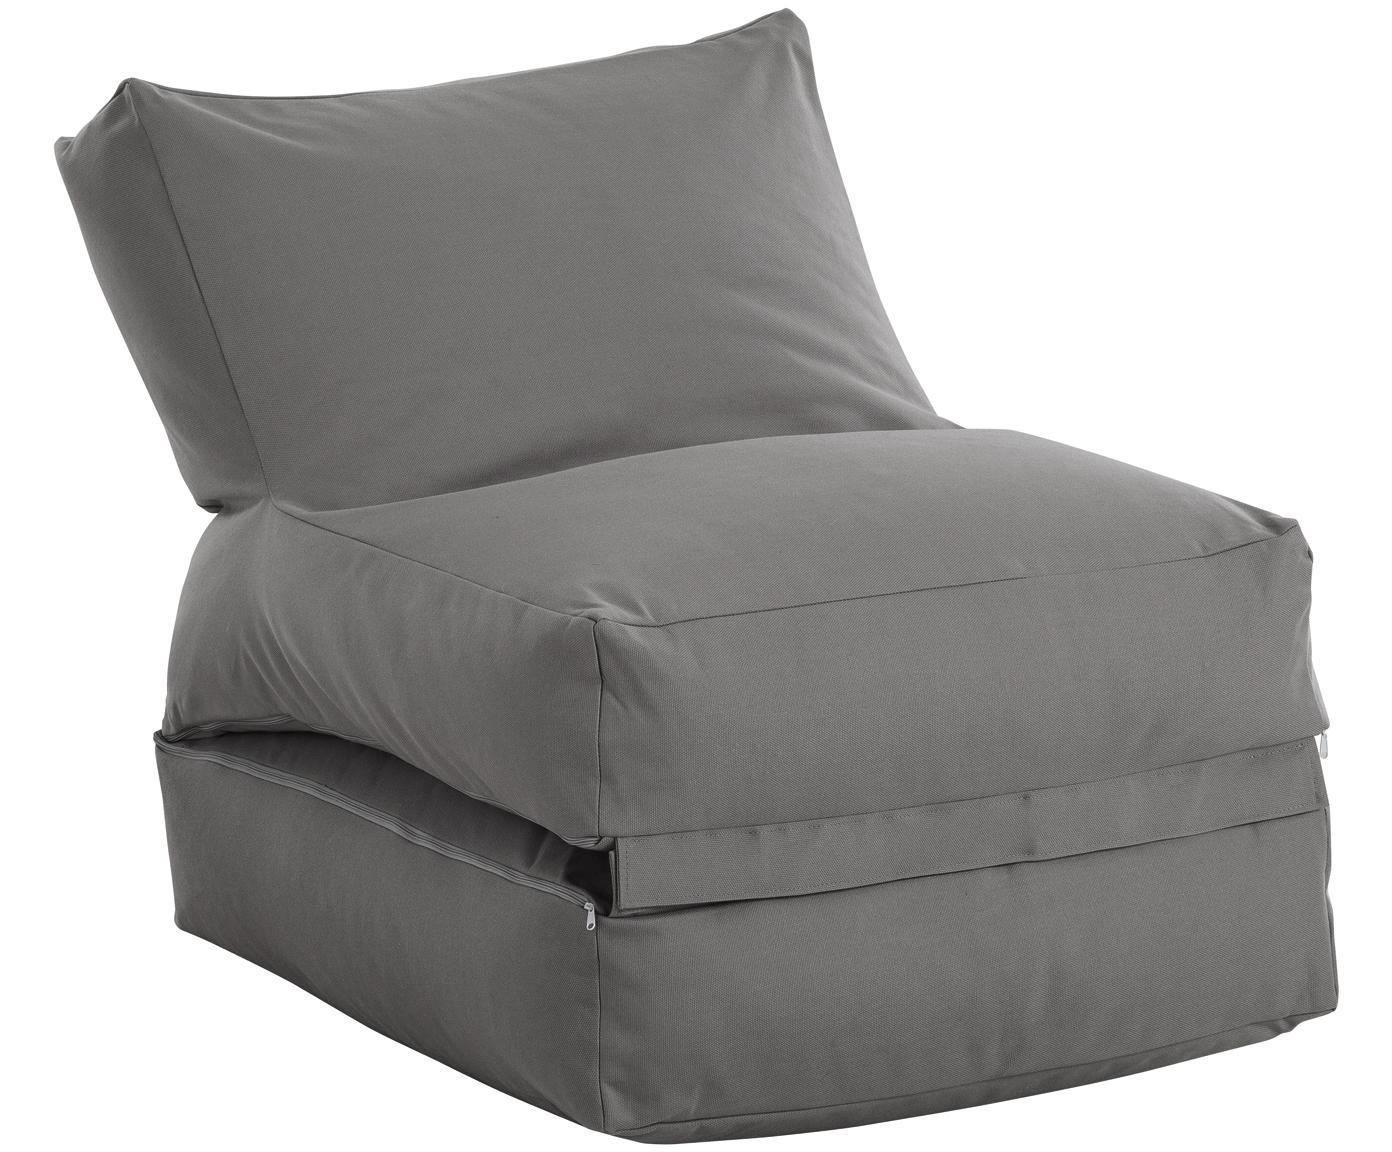 In- & Outdoor-Sitzsack Twist, Bezug: Polyacryl Dralon (garngef, Anthrazit, B 70 x T 80 cm